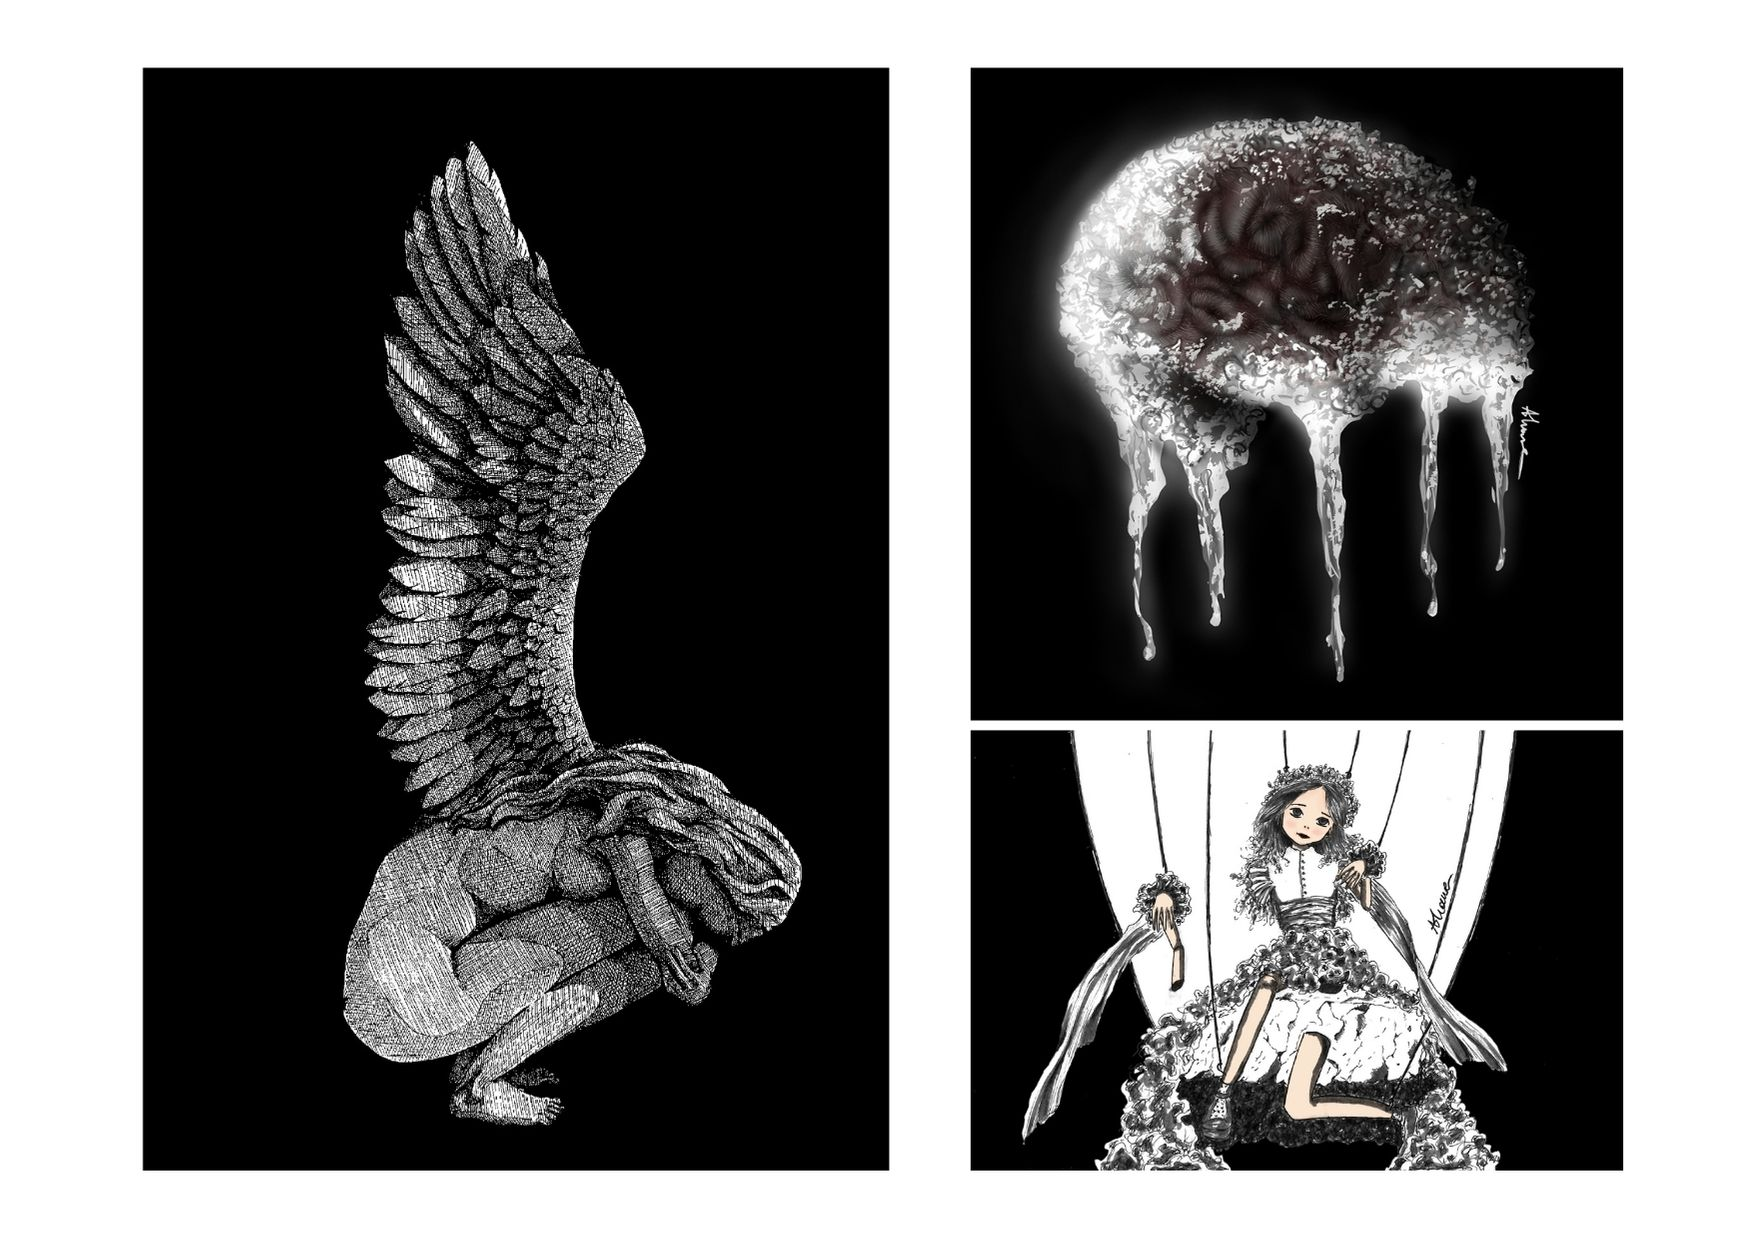 vivian terzopoulou's Work Image 3